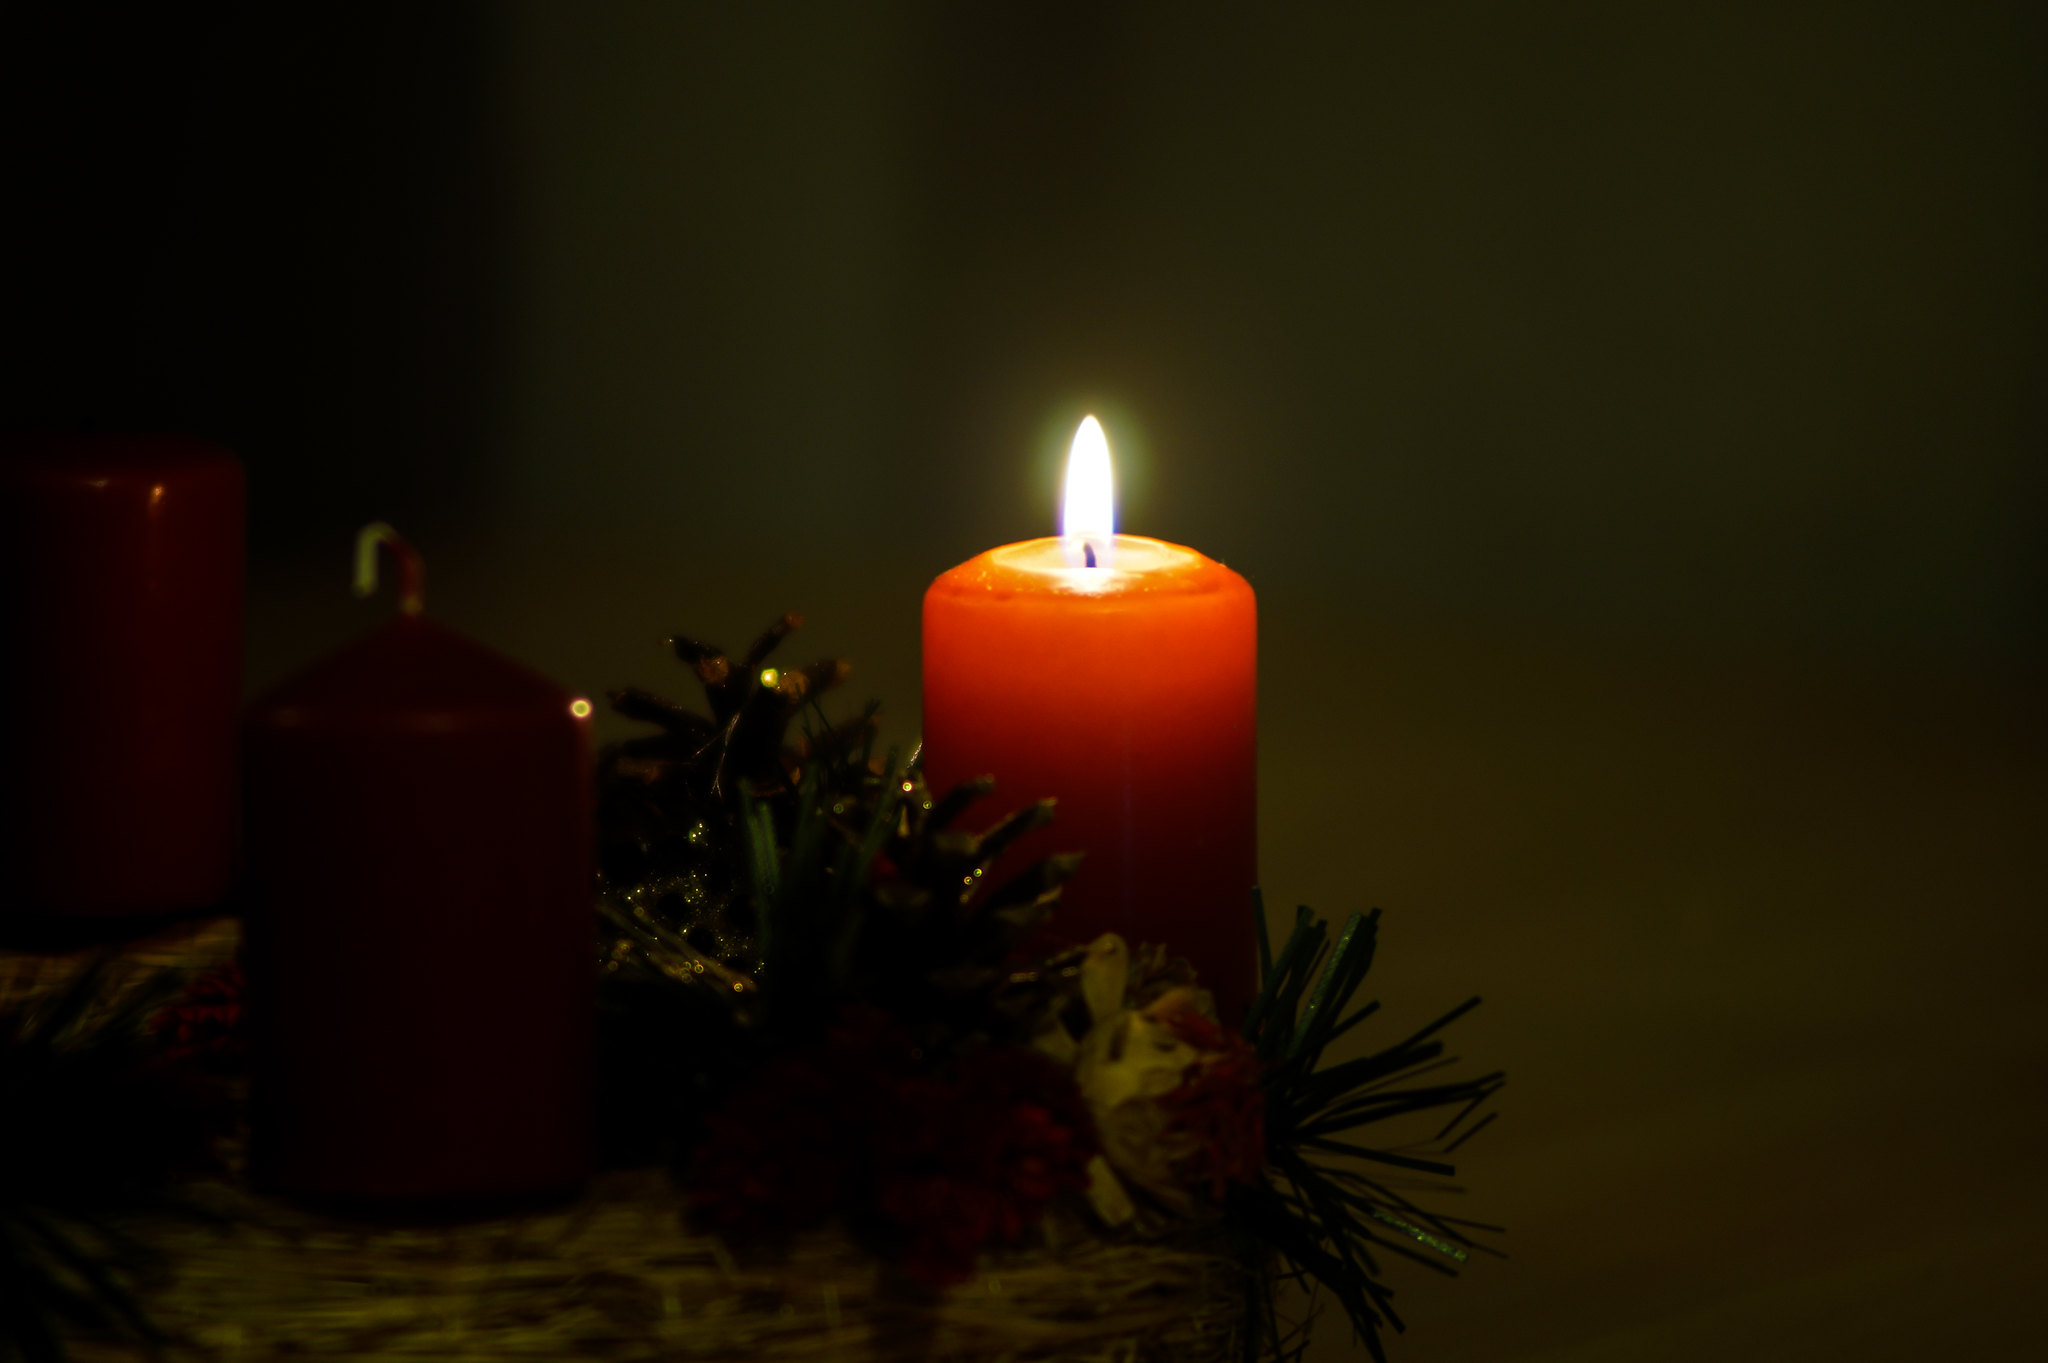 1. Advent (Foto: Sony SLT-A57 CC BY 2.0)